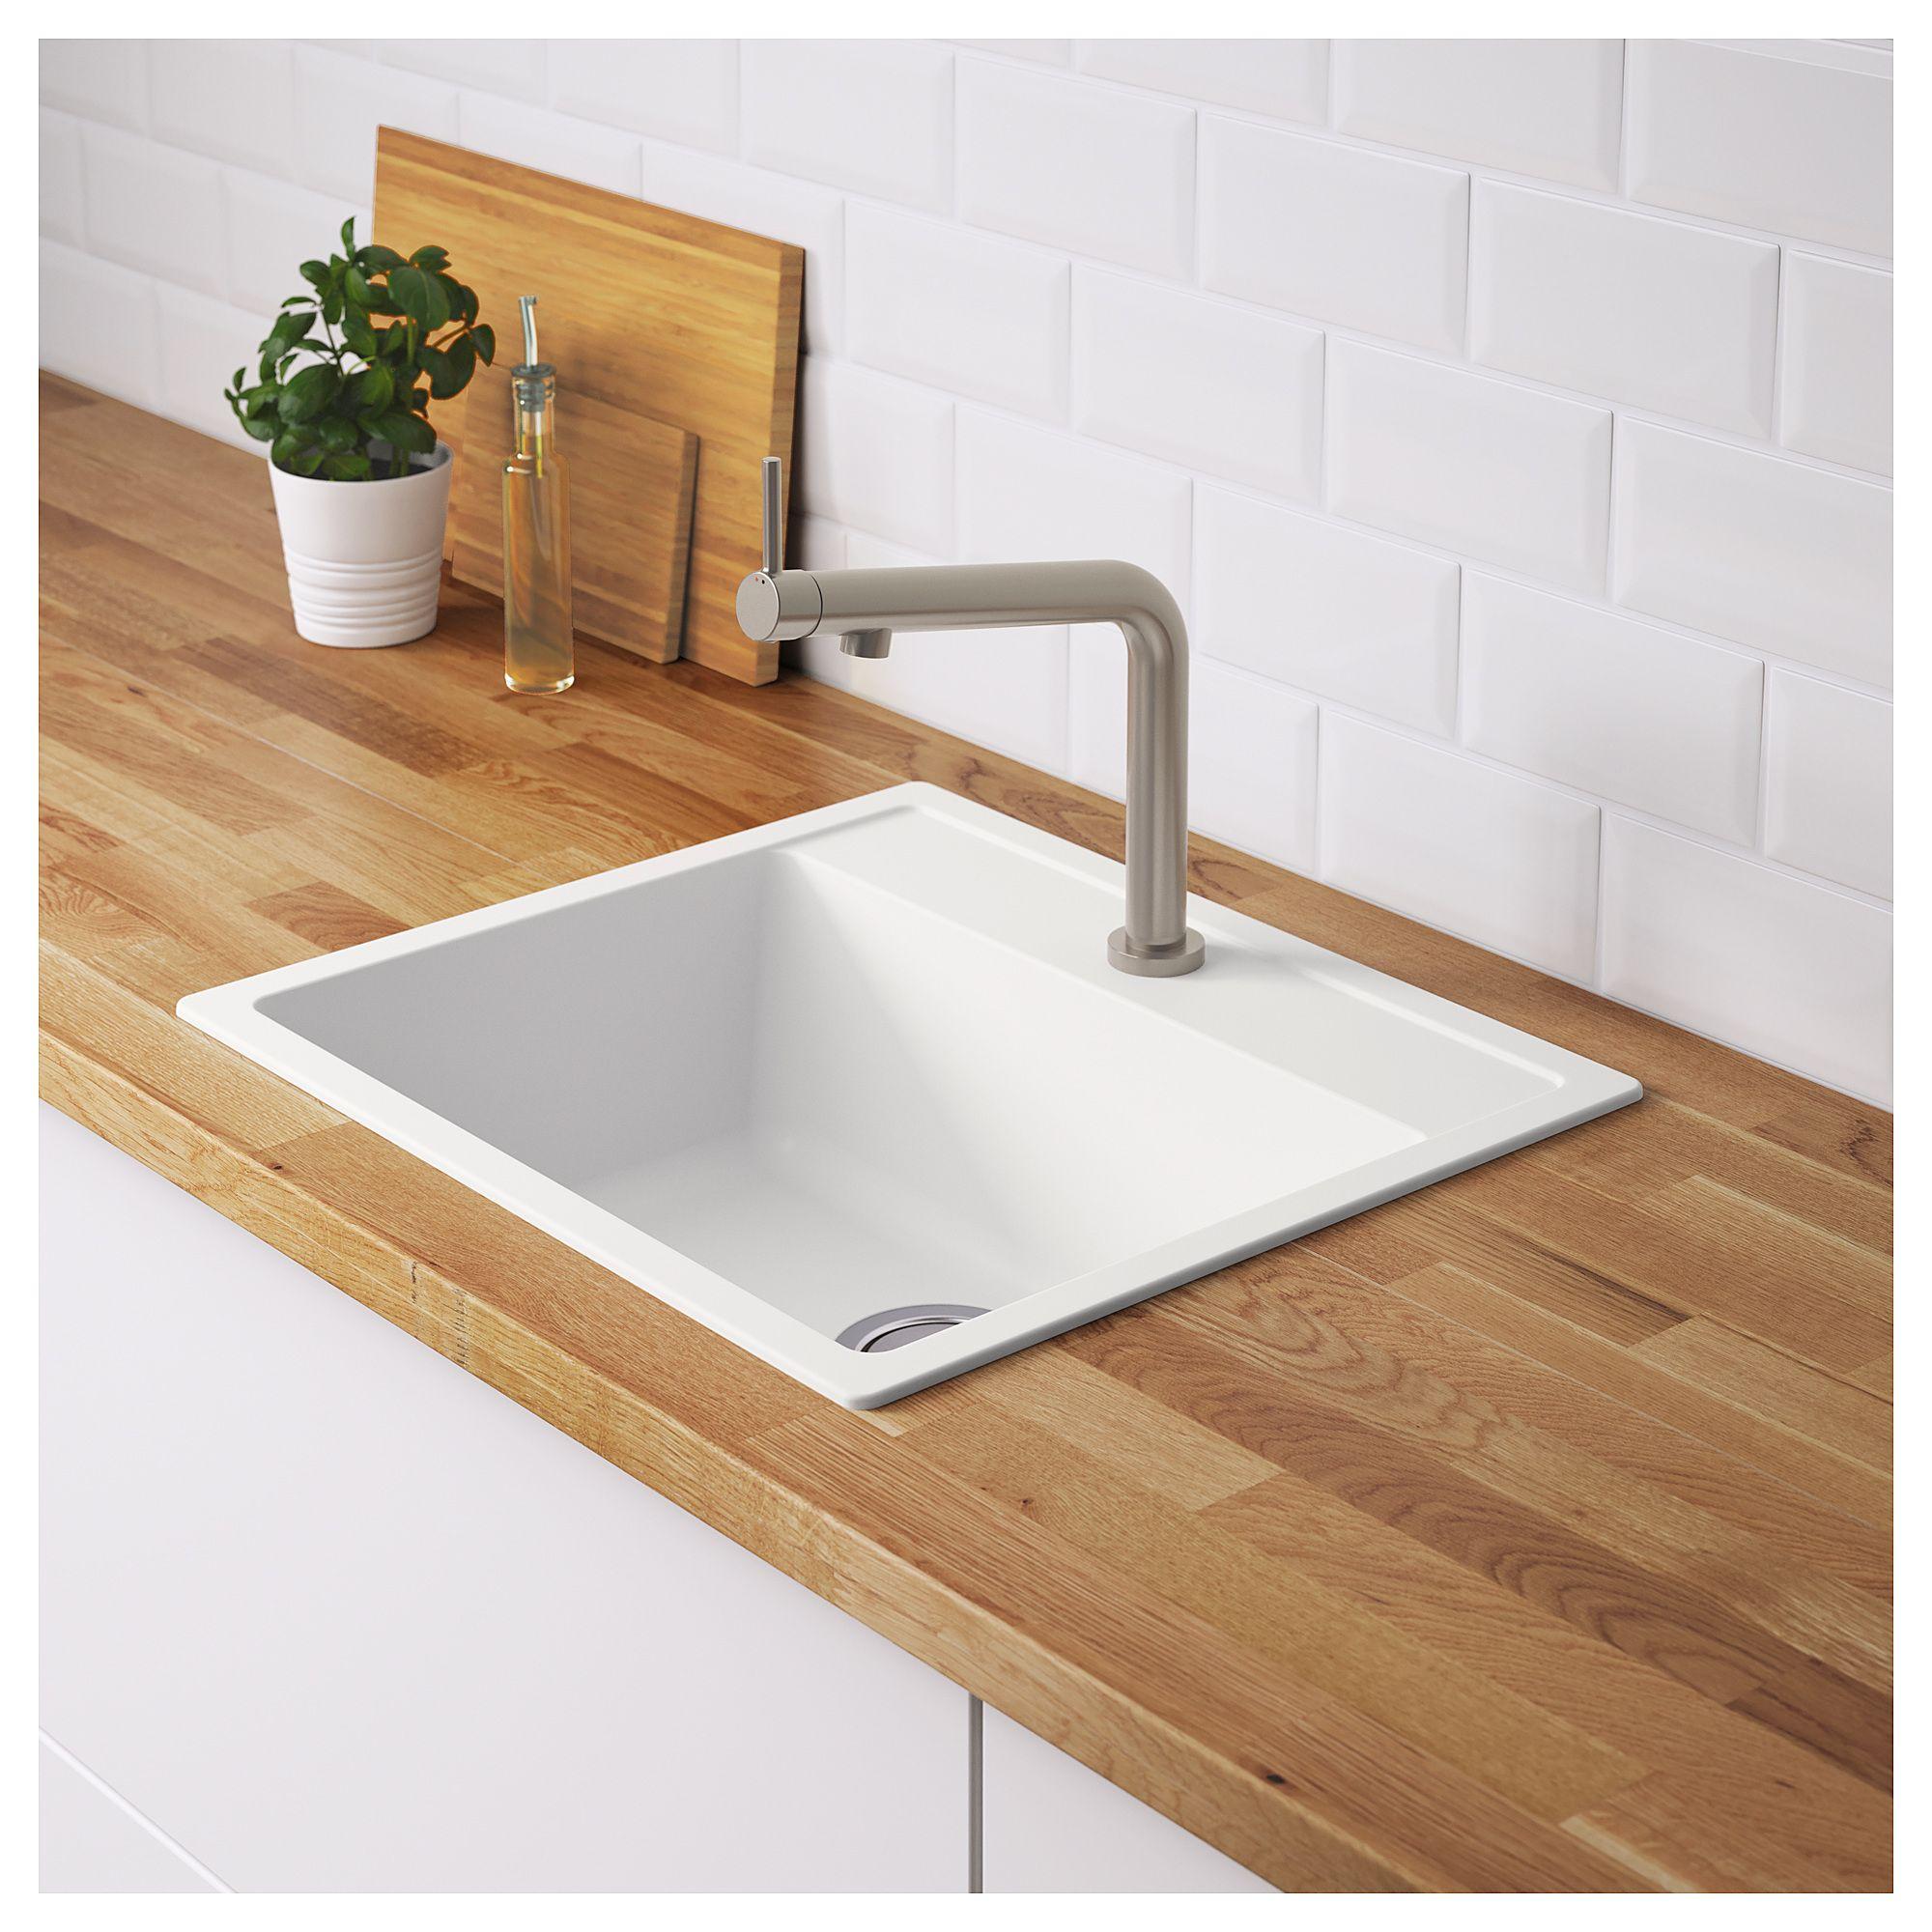 Hallviken Sink White Quartz Composite 22x19 5 8 56x50 Cm